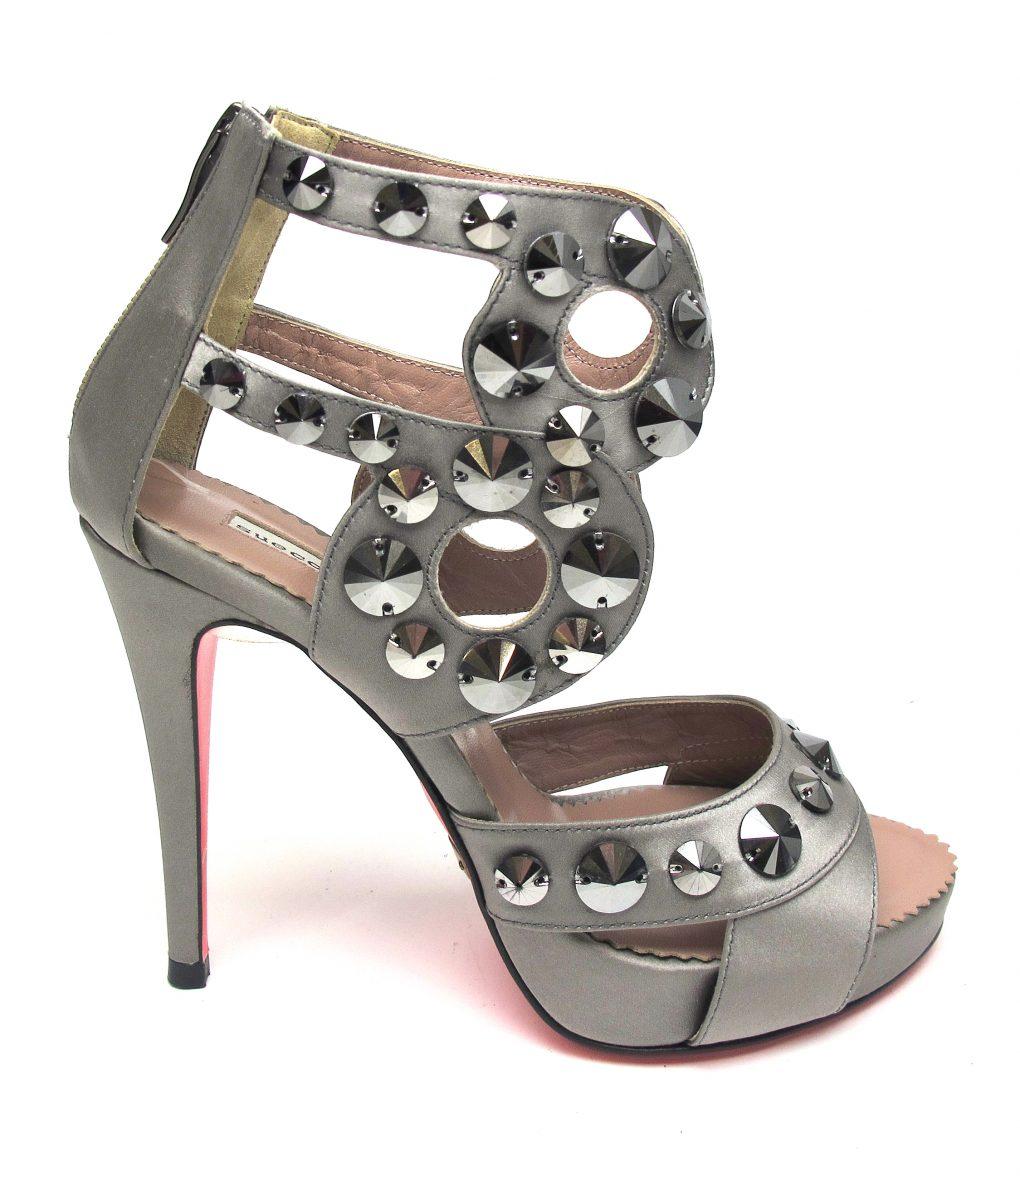 Suecomma Bonnie metallic Pewter & Swarovski Gladiator heels